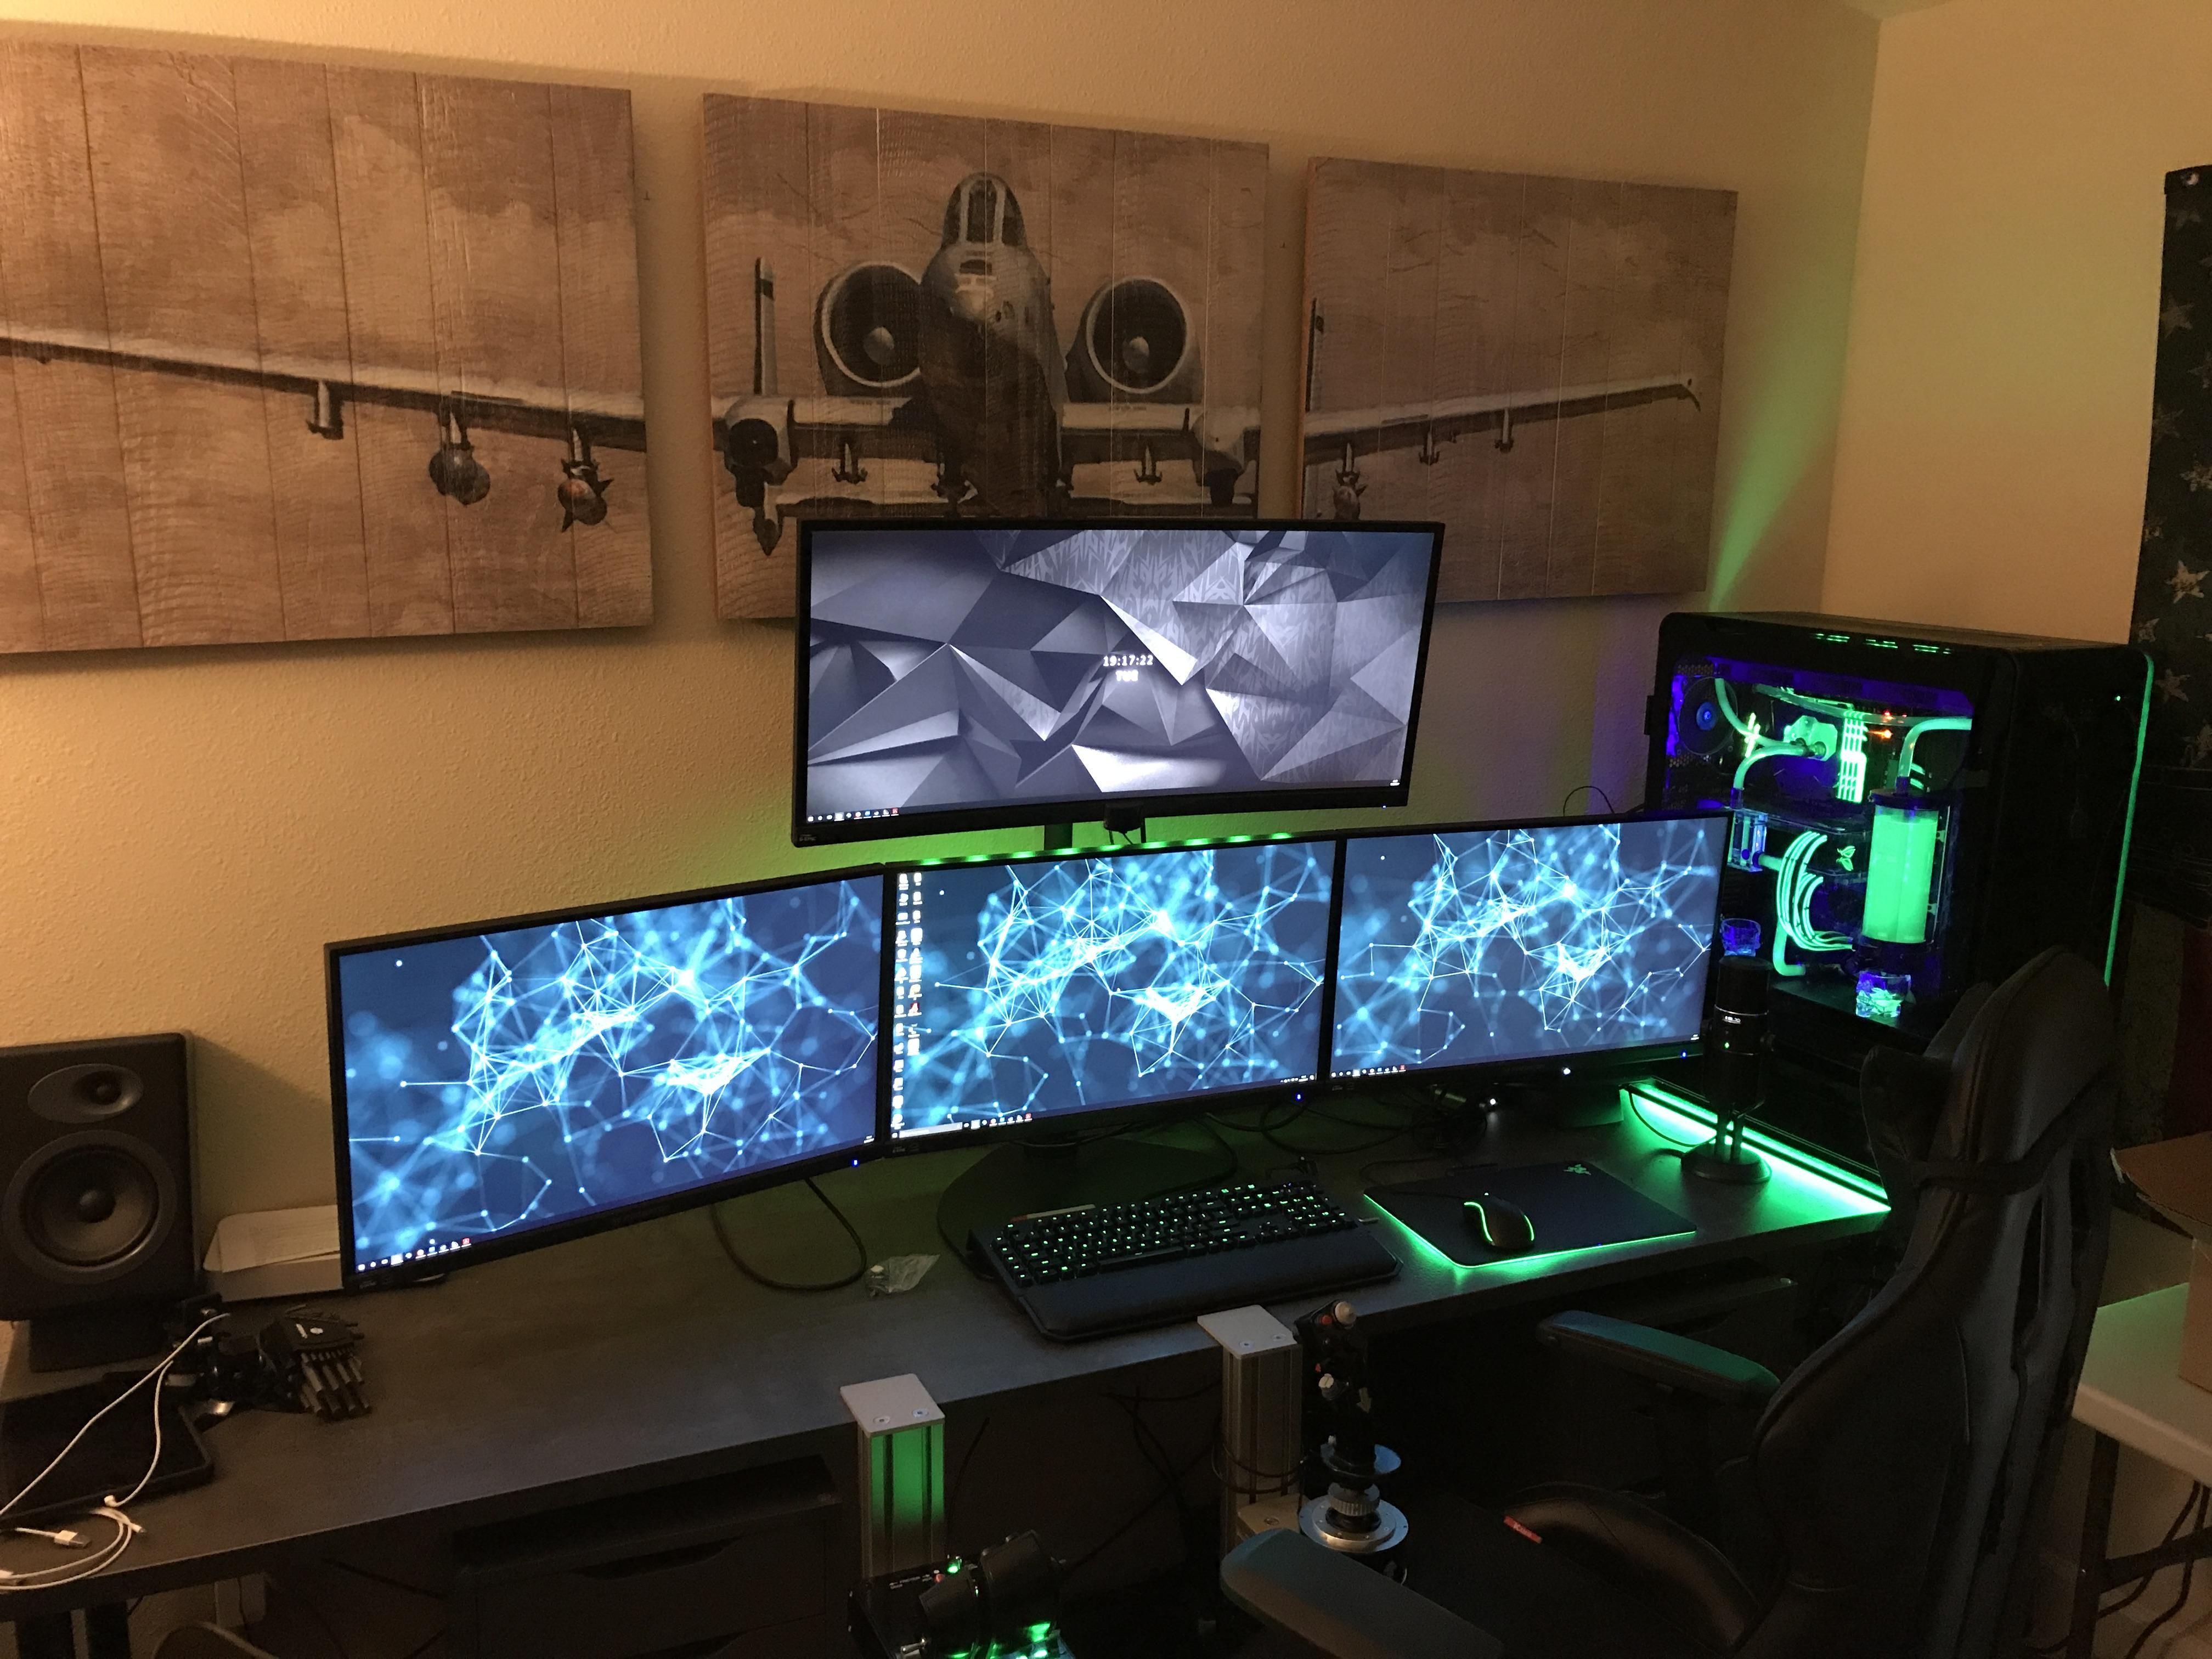 Dcs Prepar3d Battle Station 3 4k Acer Xb271hk 1 Acer X34